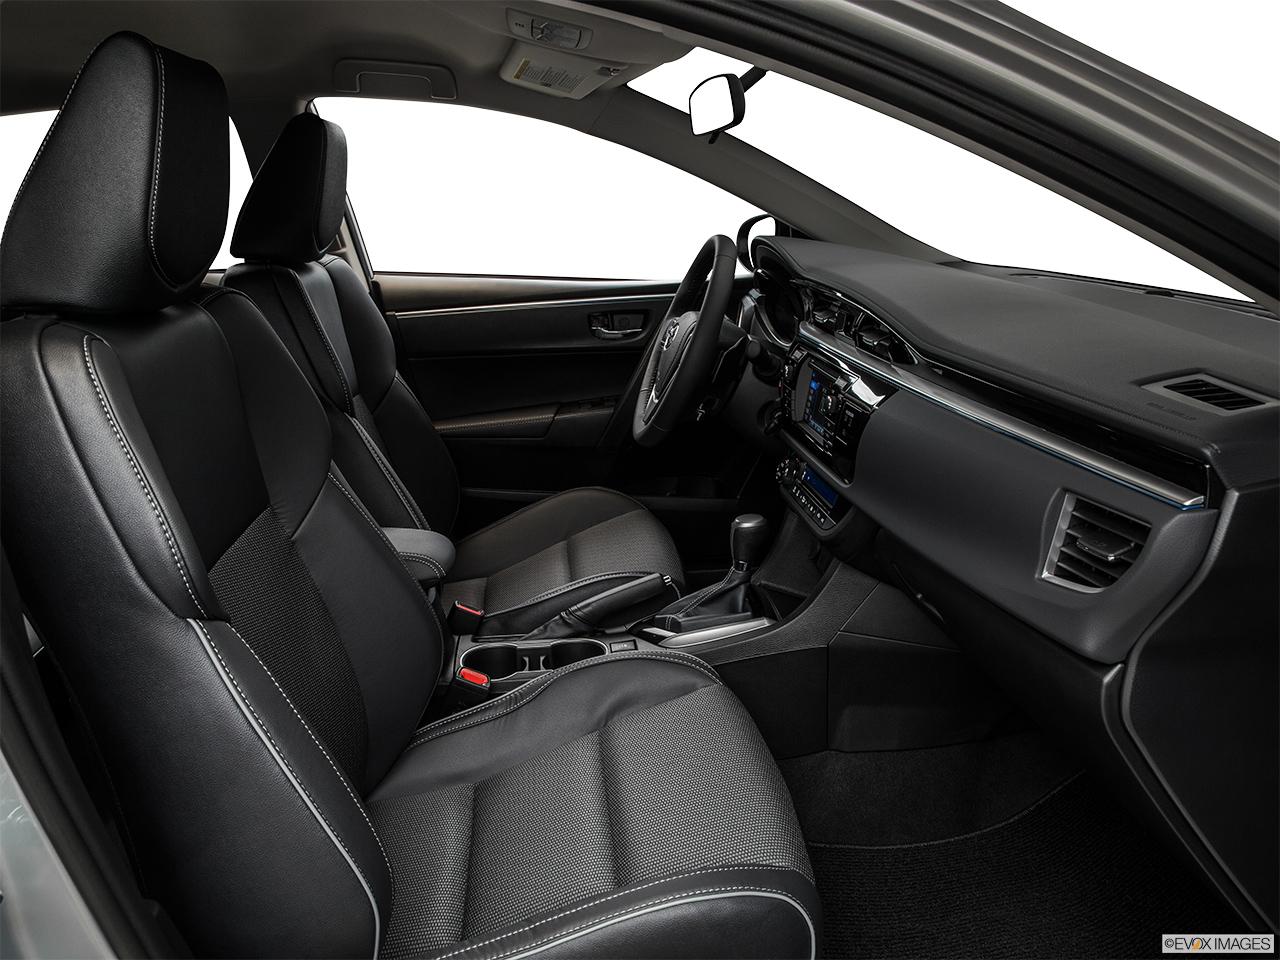 2015 Toyota Corolla 4dr Sedan Manual S Plus - Passenger seat